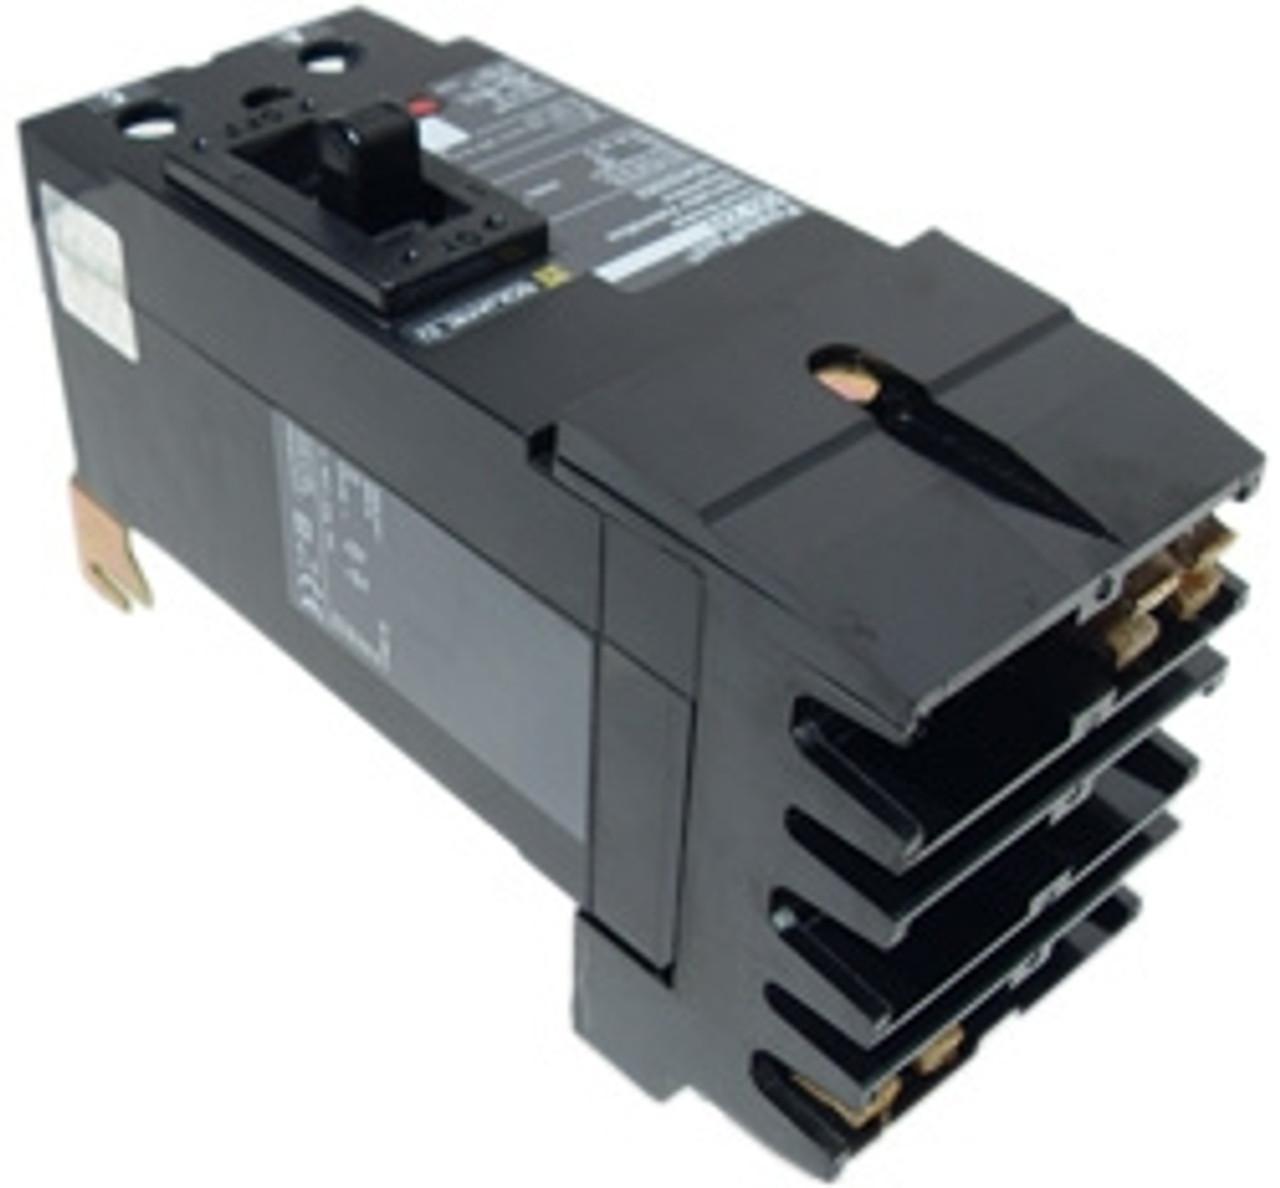 Square D Q222150BCH 2 Pole 150 Amp 240VAC Circuit Breaker - Used